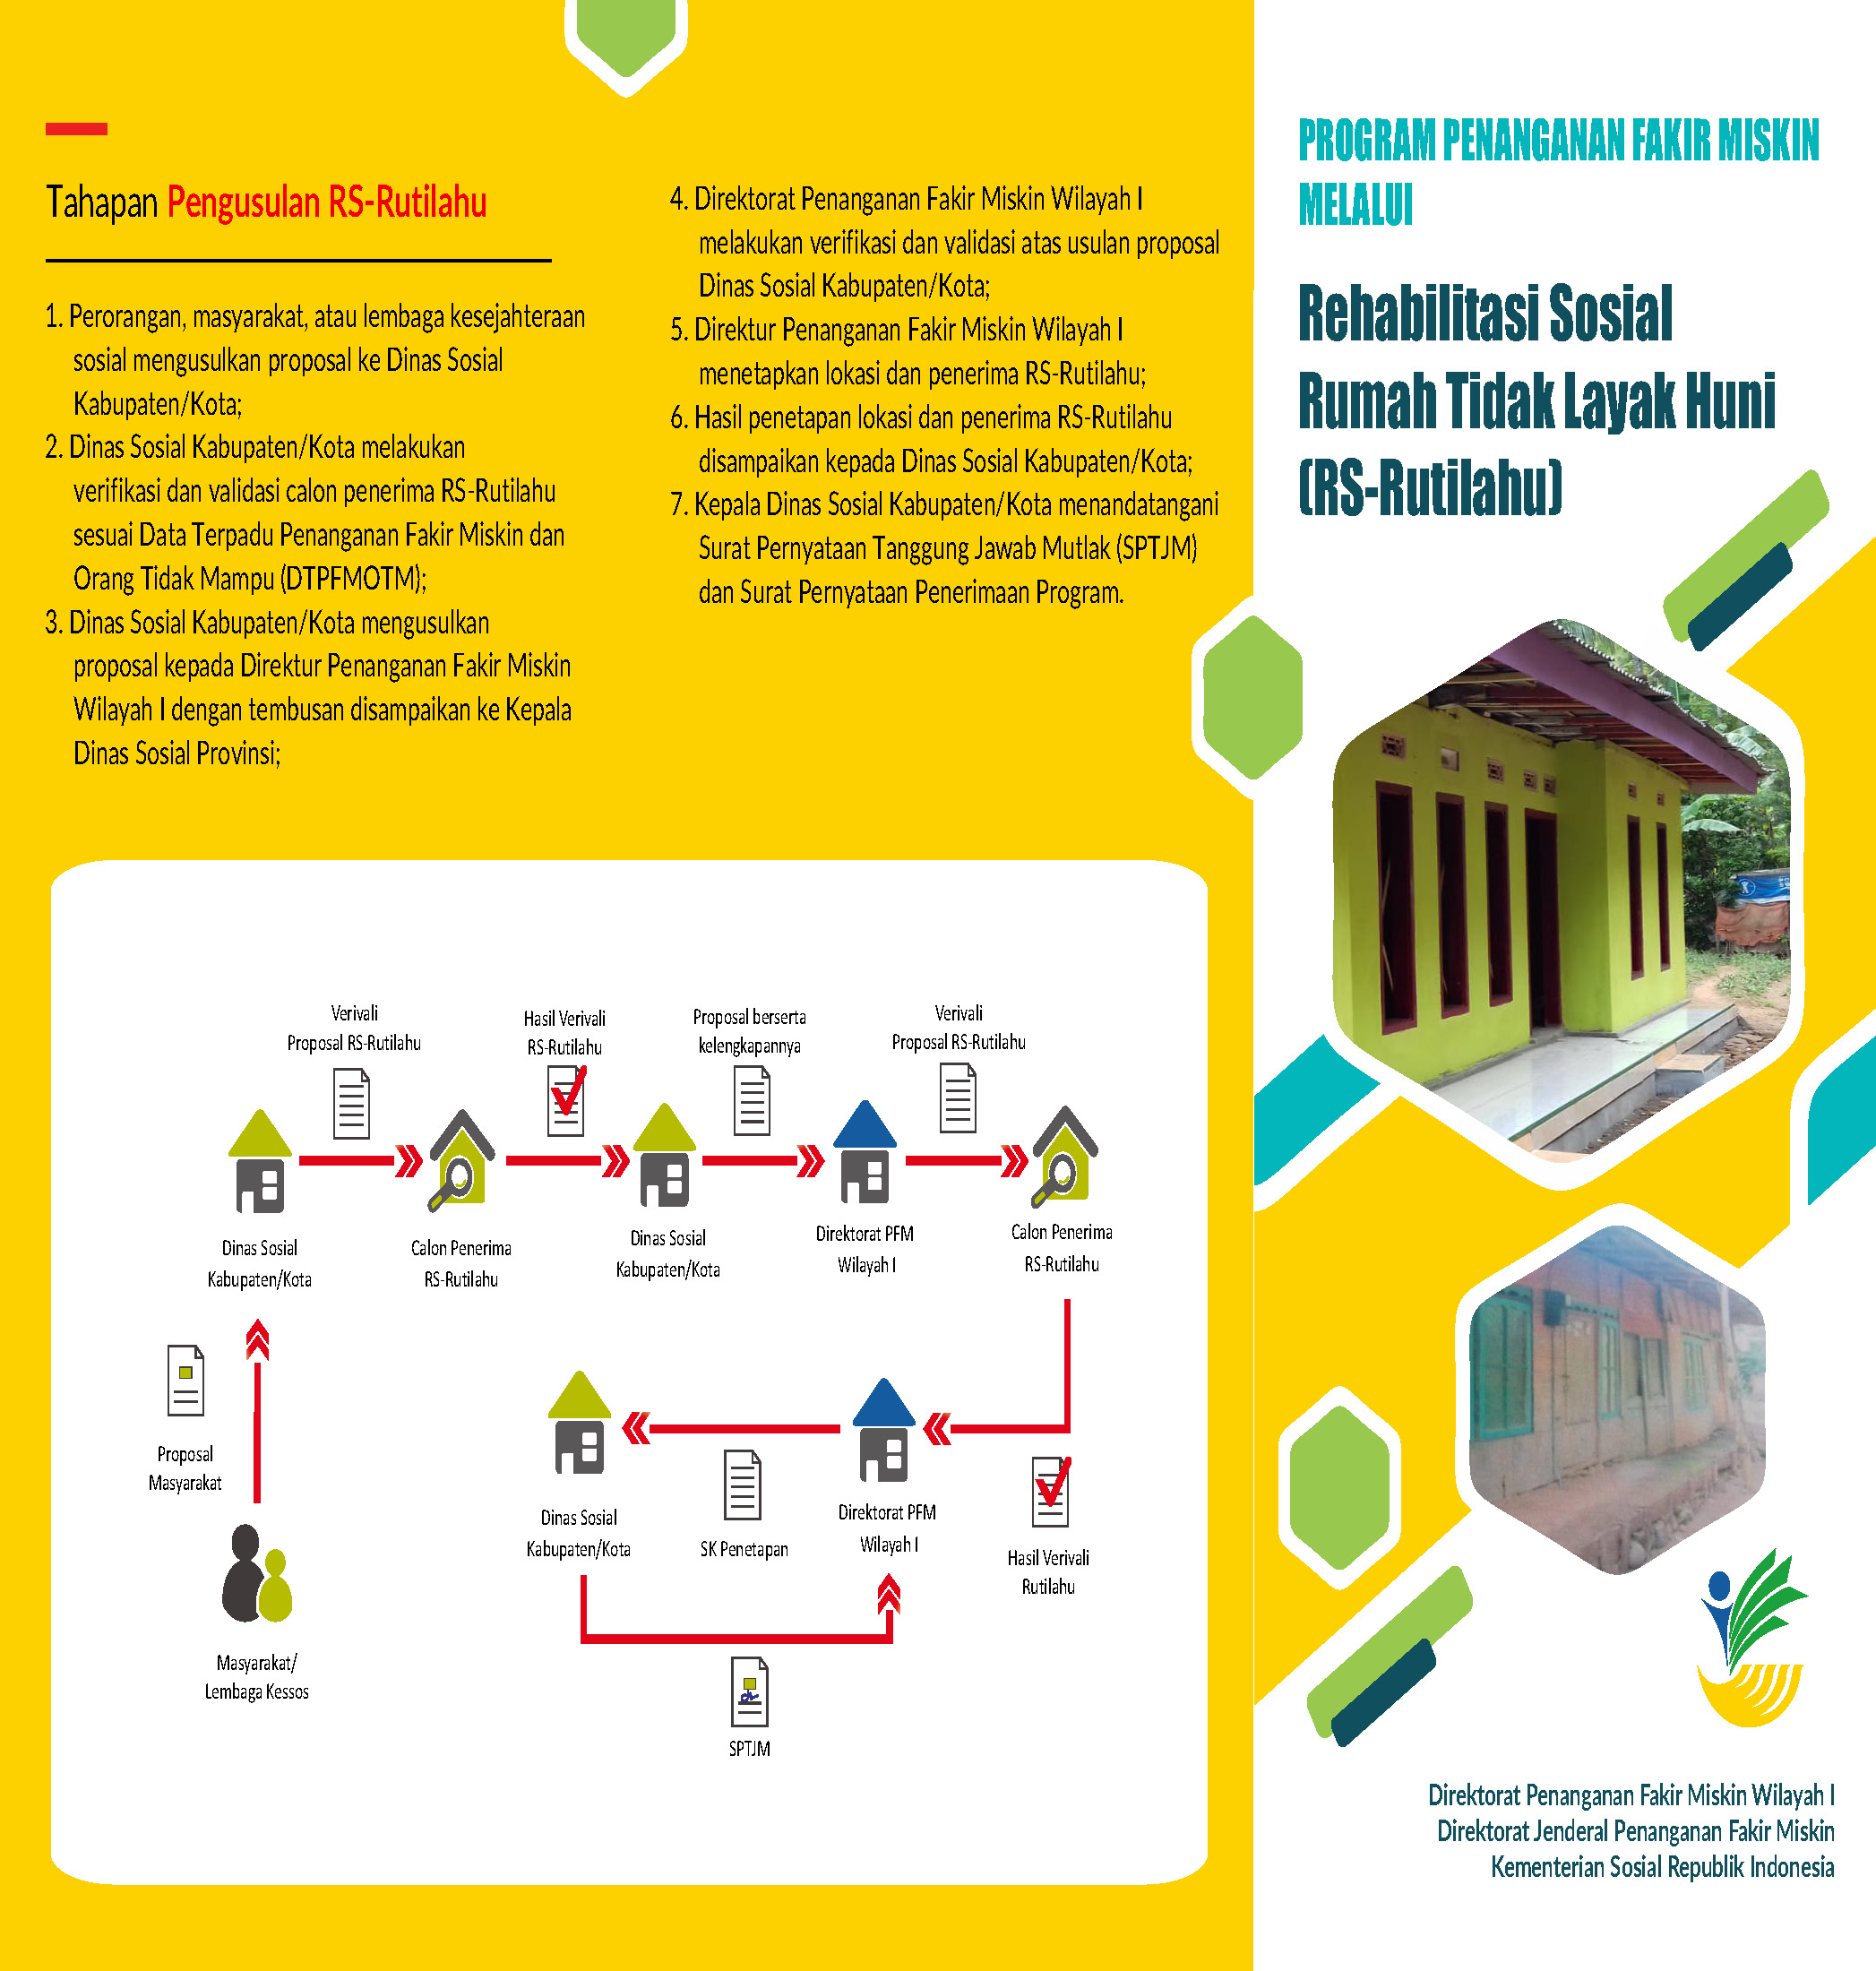 2019.03.08_Desain Leaflet PFM-Rutilahu REVISI X5 Kuning Revisi_Page_2